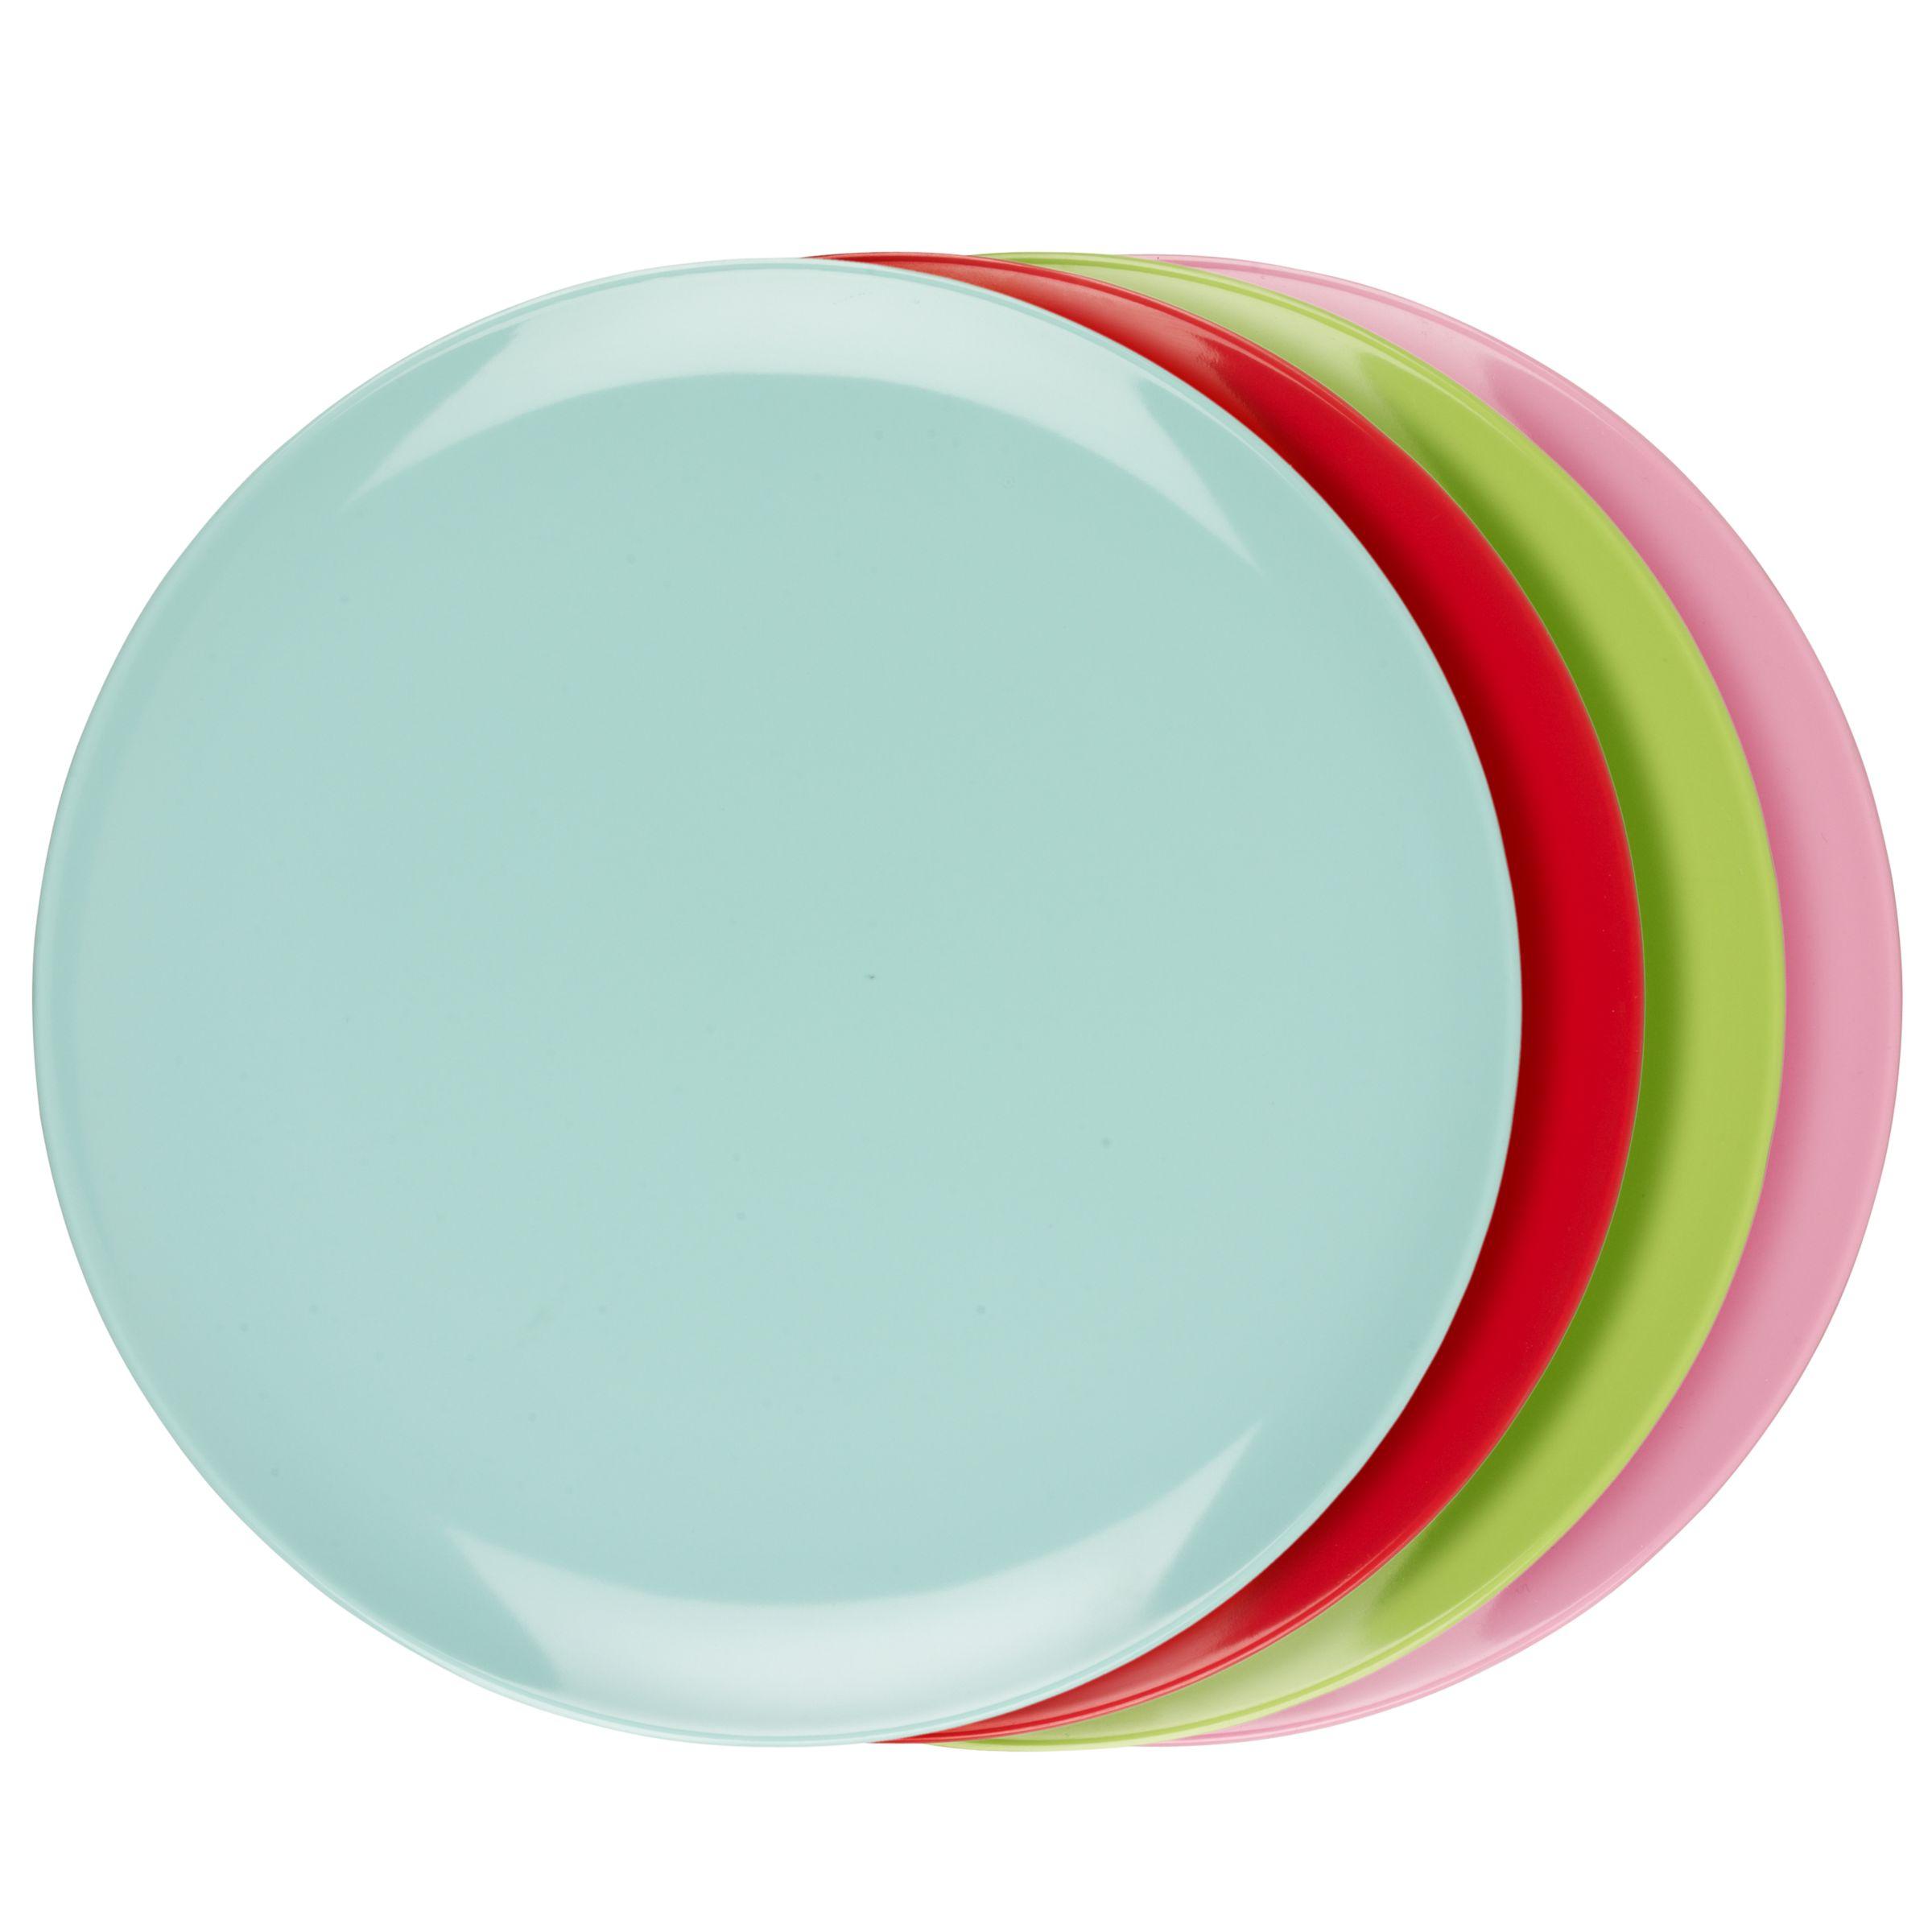 John Lewis Brights Plates, Set of 4